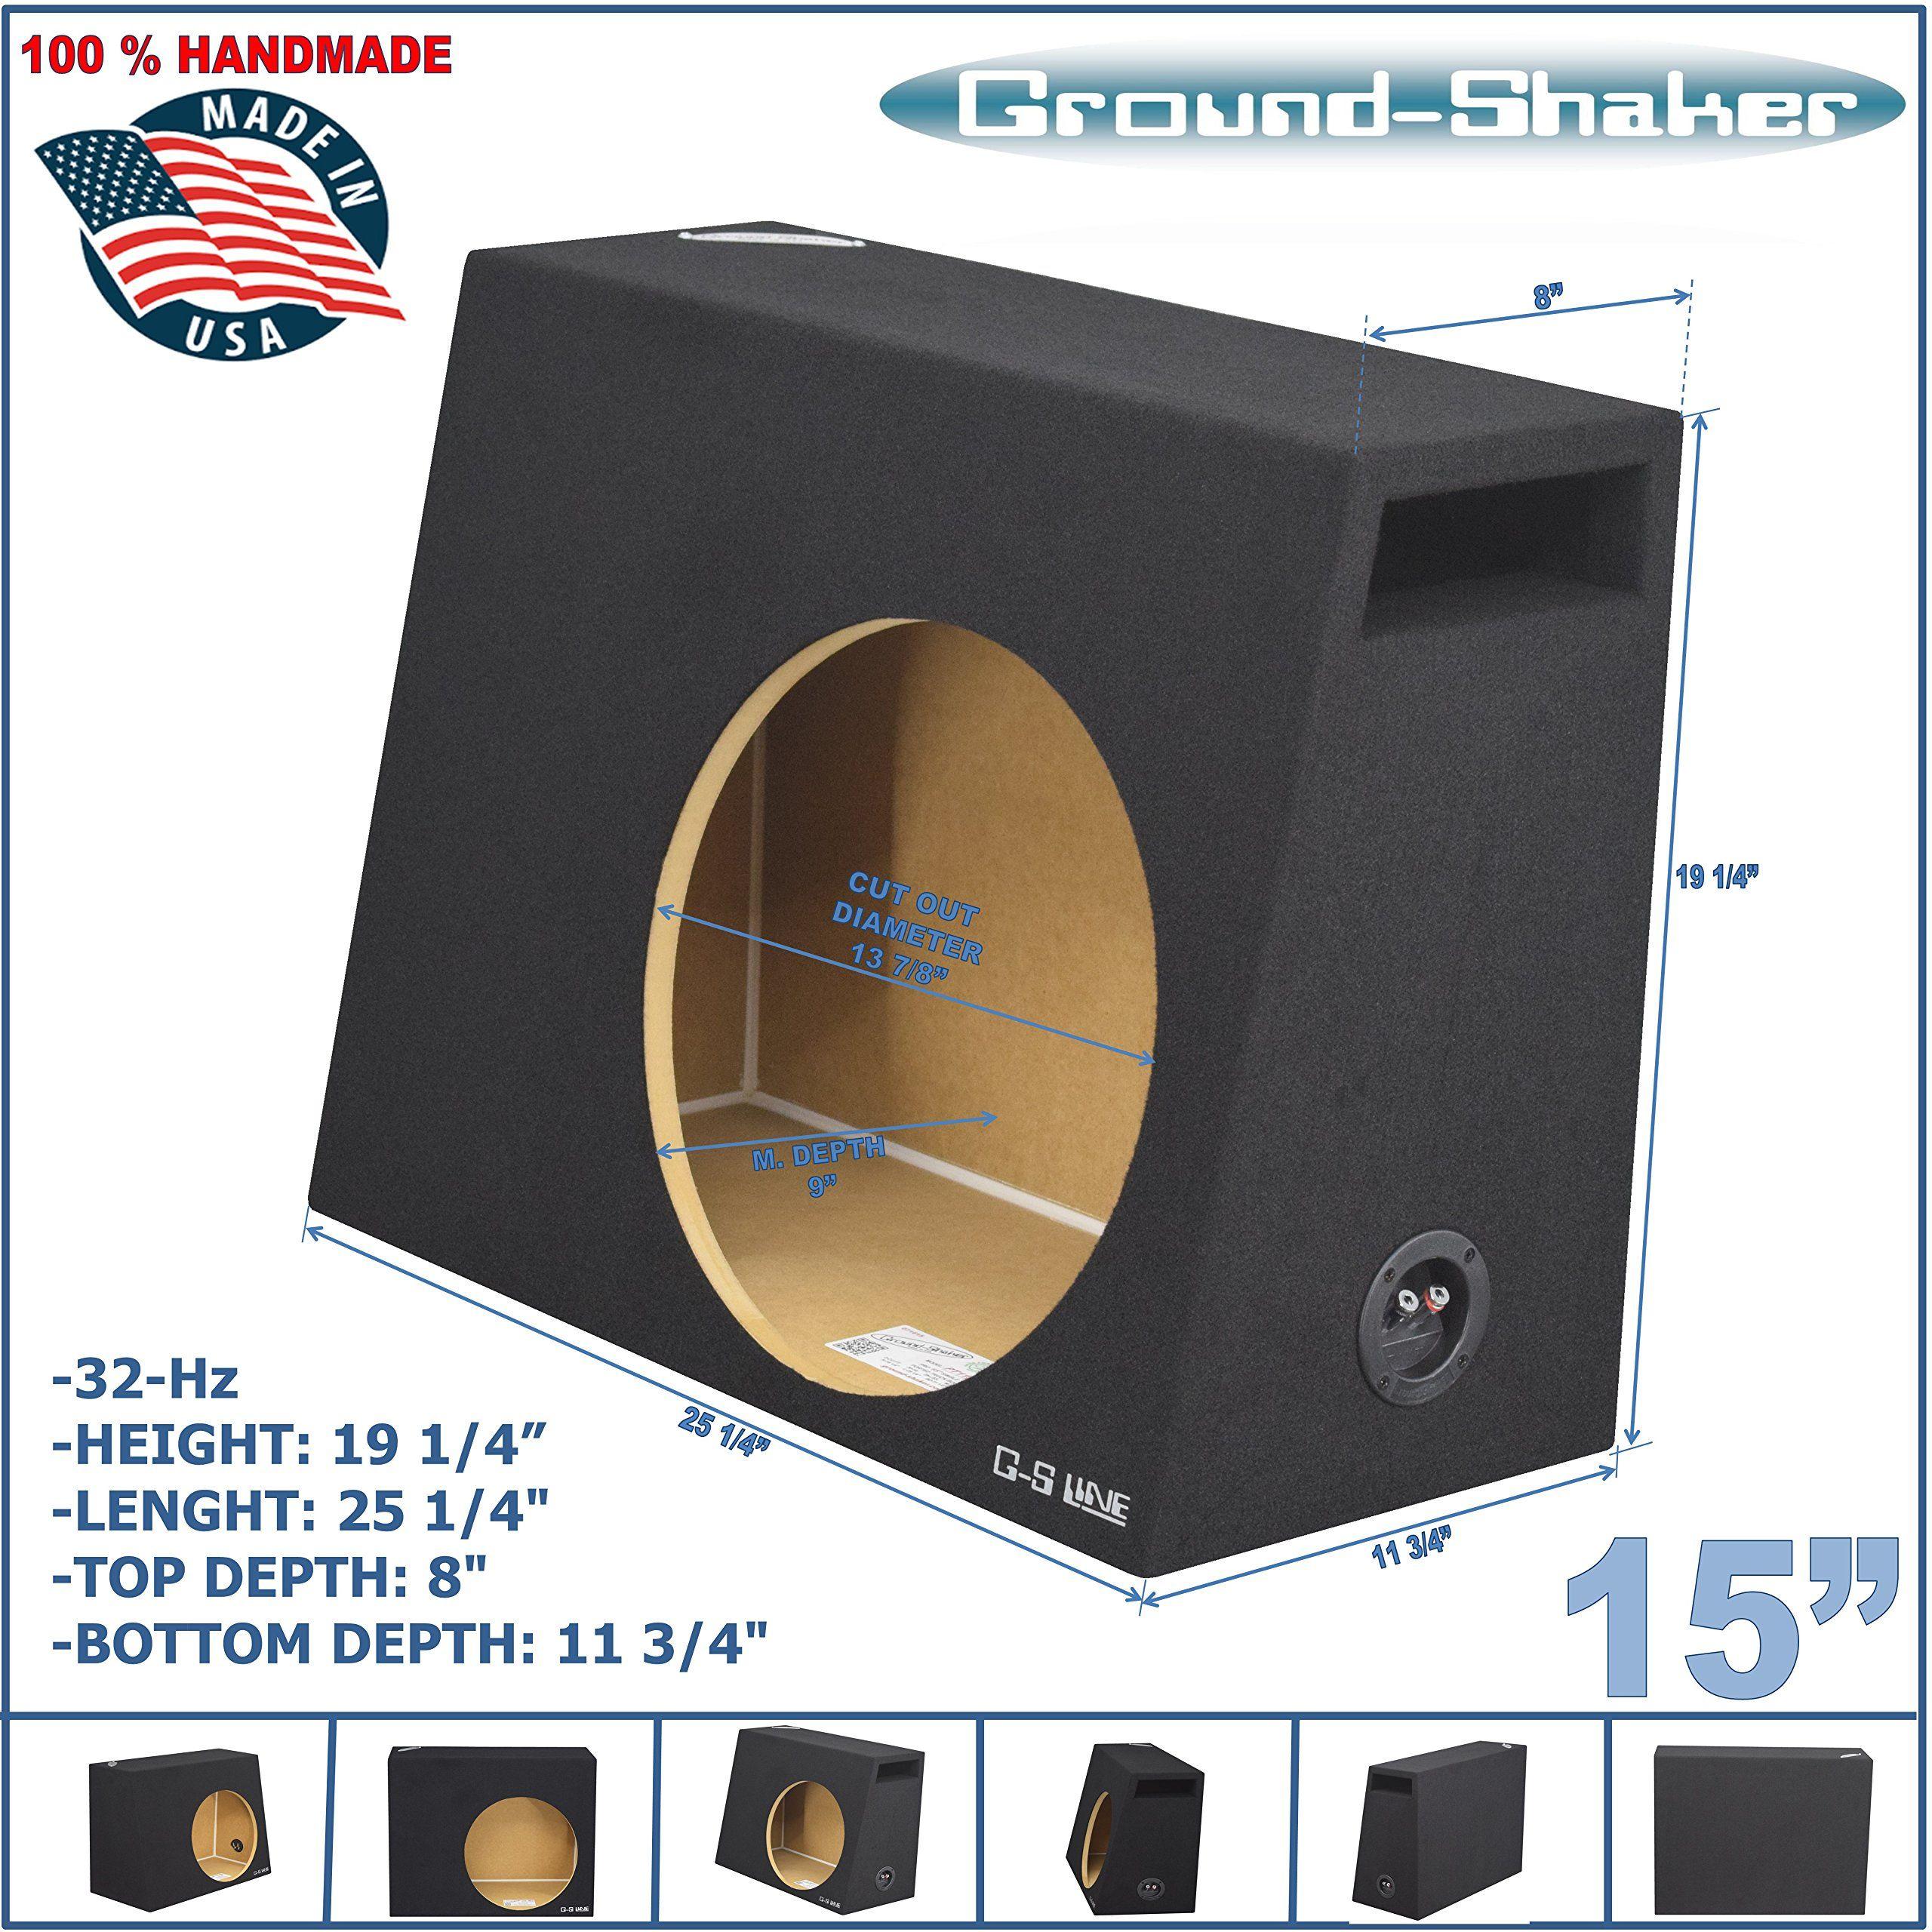 15 Single Vented Sub Box 33 Hz Slot Ported Compact Subwoofer Enclosure Subwoofer Enclosure Sub Box Subwoofer